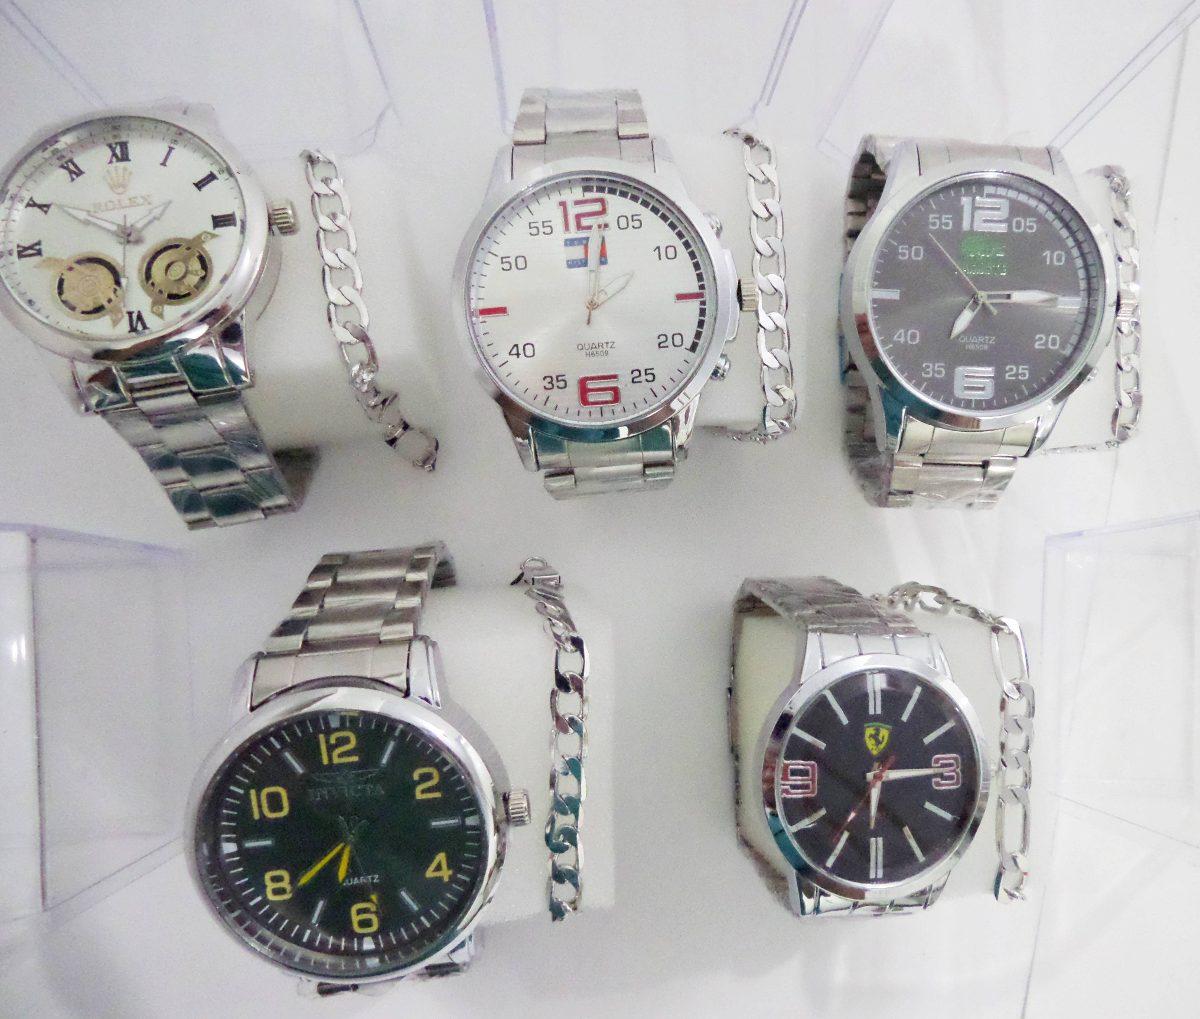 970dcdf53f0 ... relógios masculinos+ 05 pulseiras aço inox atacado. Carregando zoom.